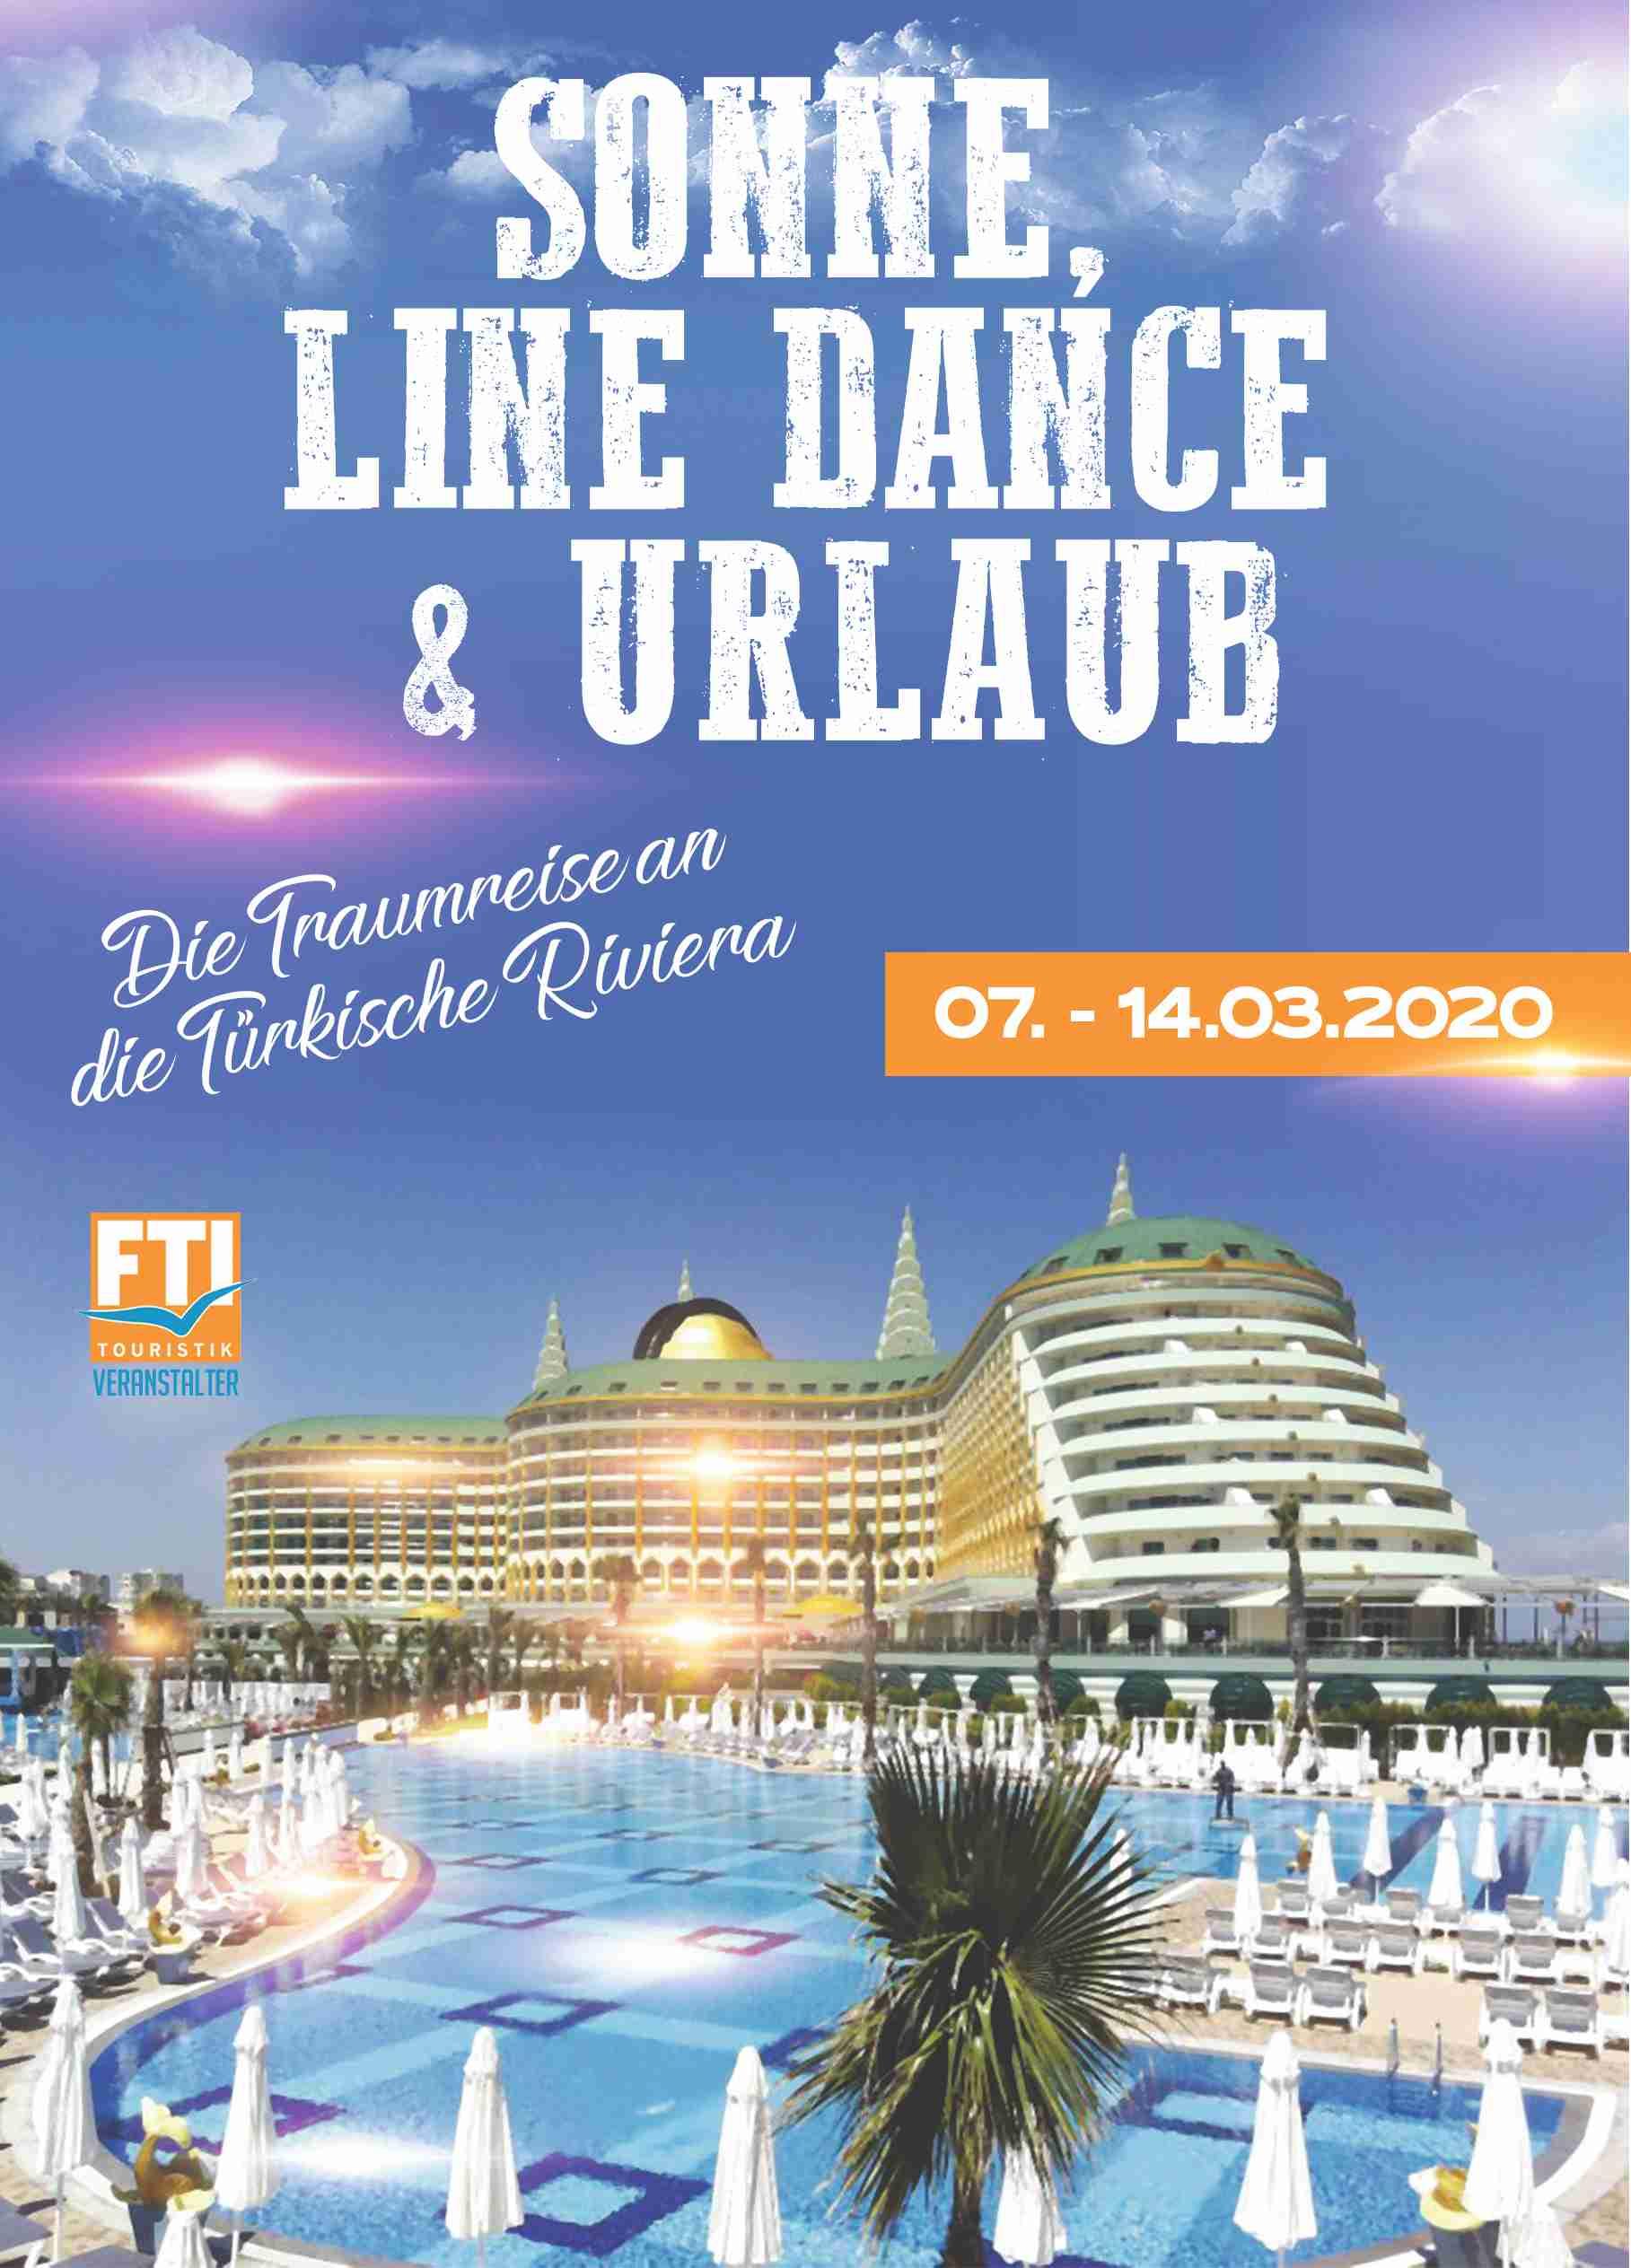 2019_Jimmy_Linedance_Urlaub_aussen_re-1